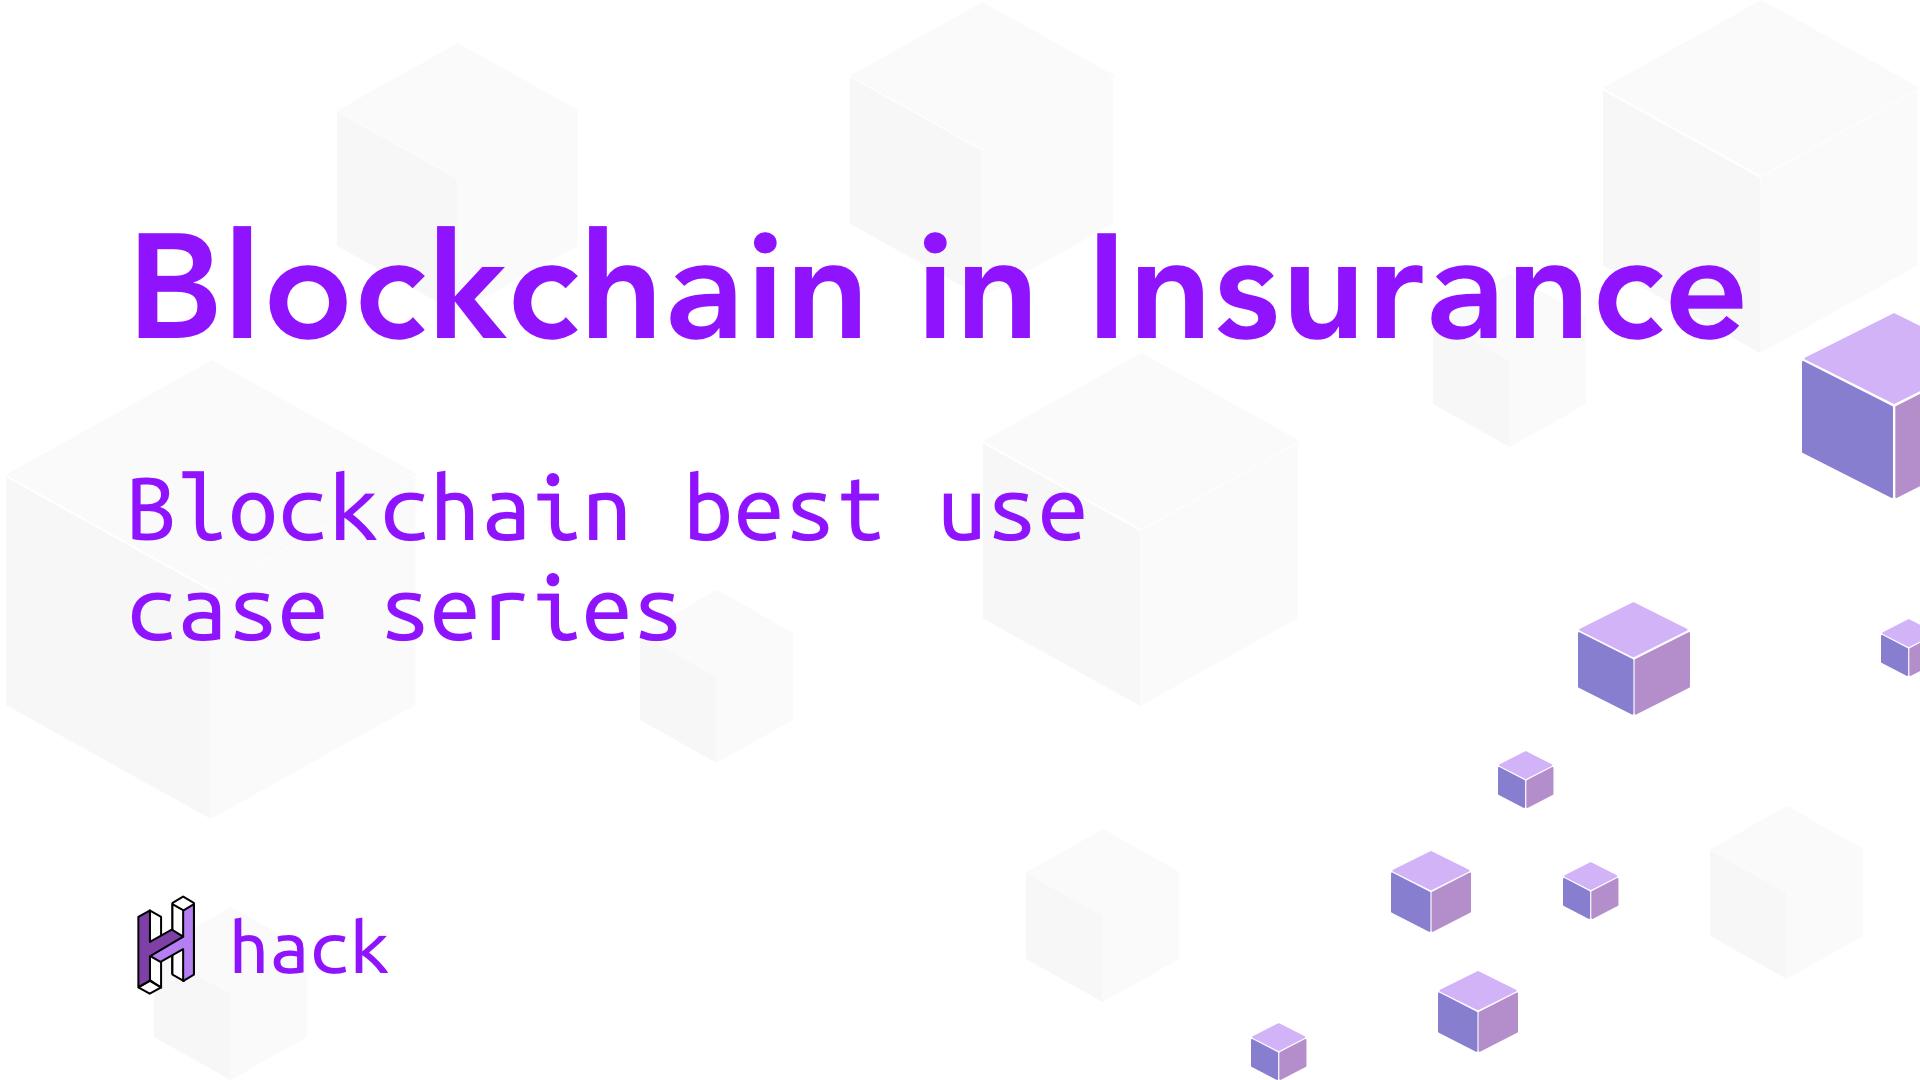 Blockchain in Insurance - Blockchain best use case series